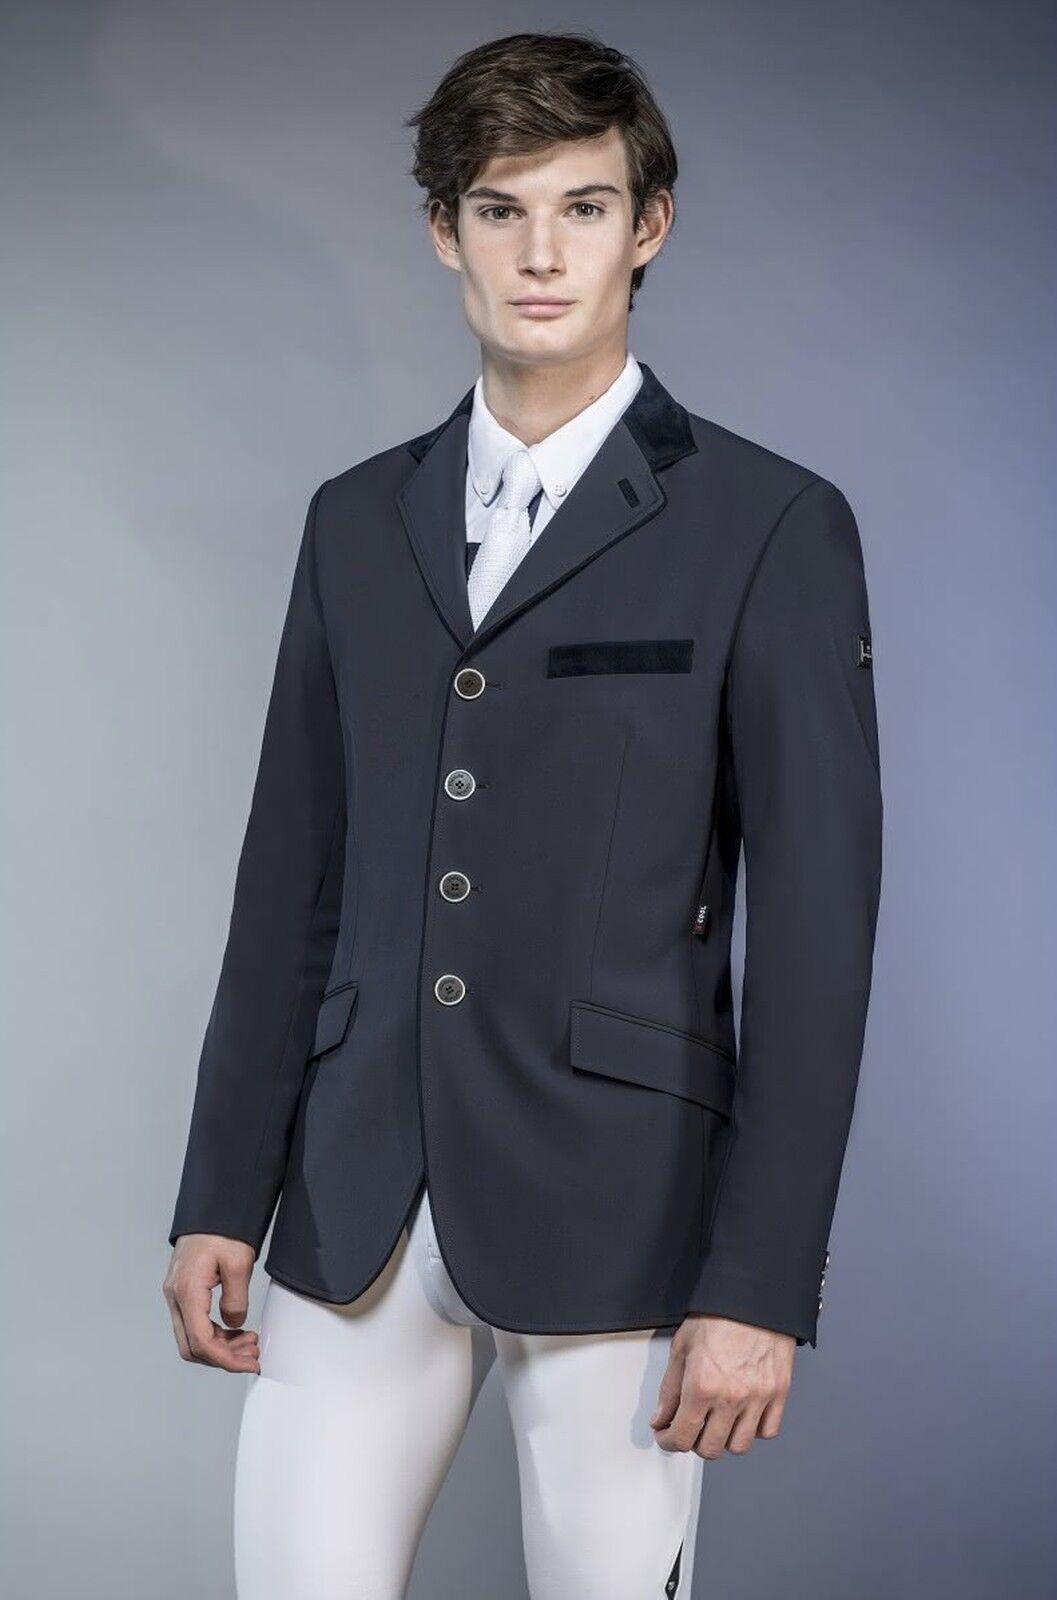 Equiline señores de tu chaqueta  elios , caballeros turnierjacket, turniersakko, azul